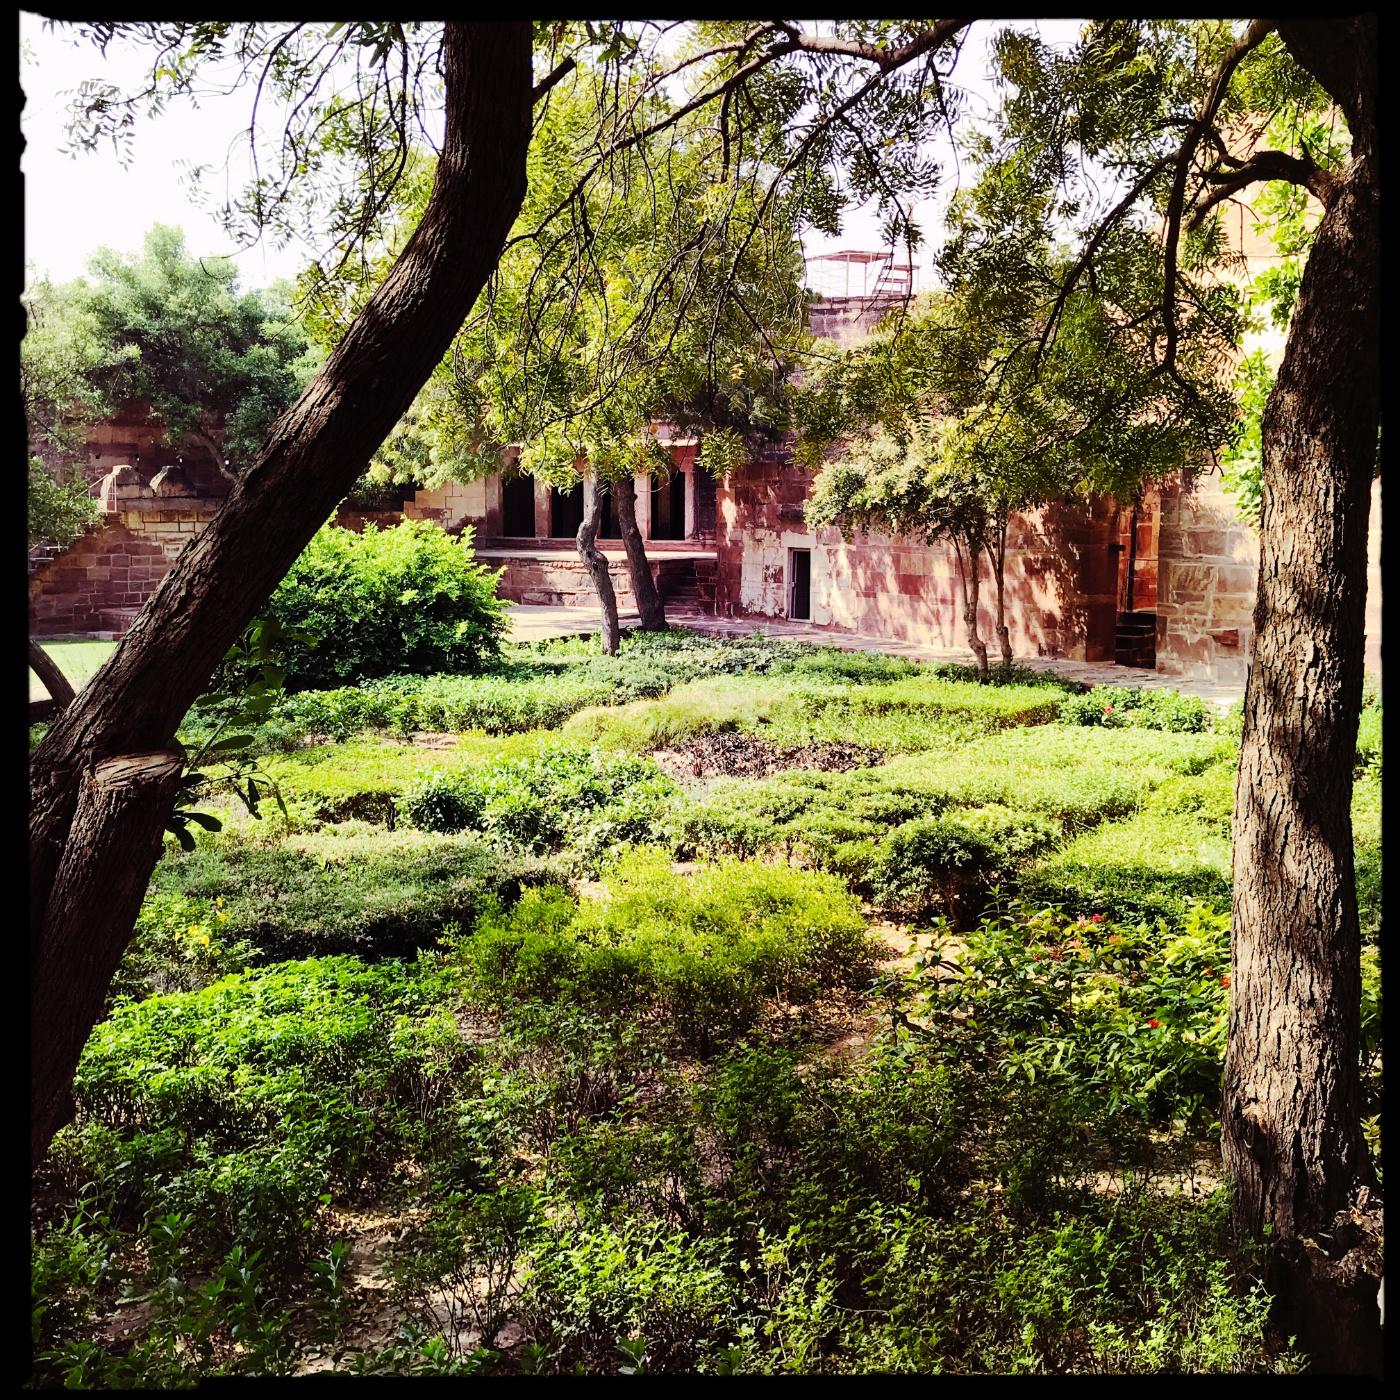 628-India-Jodhpur